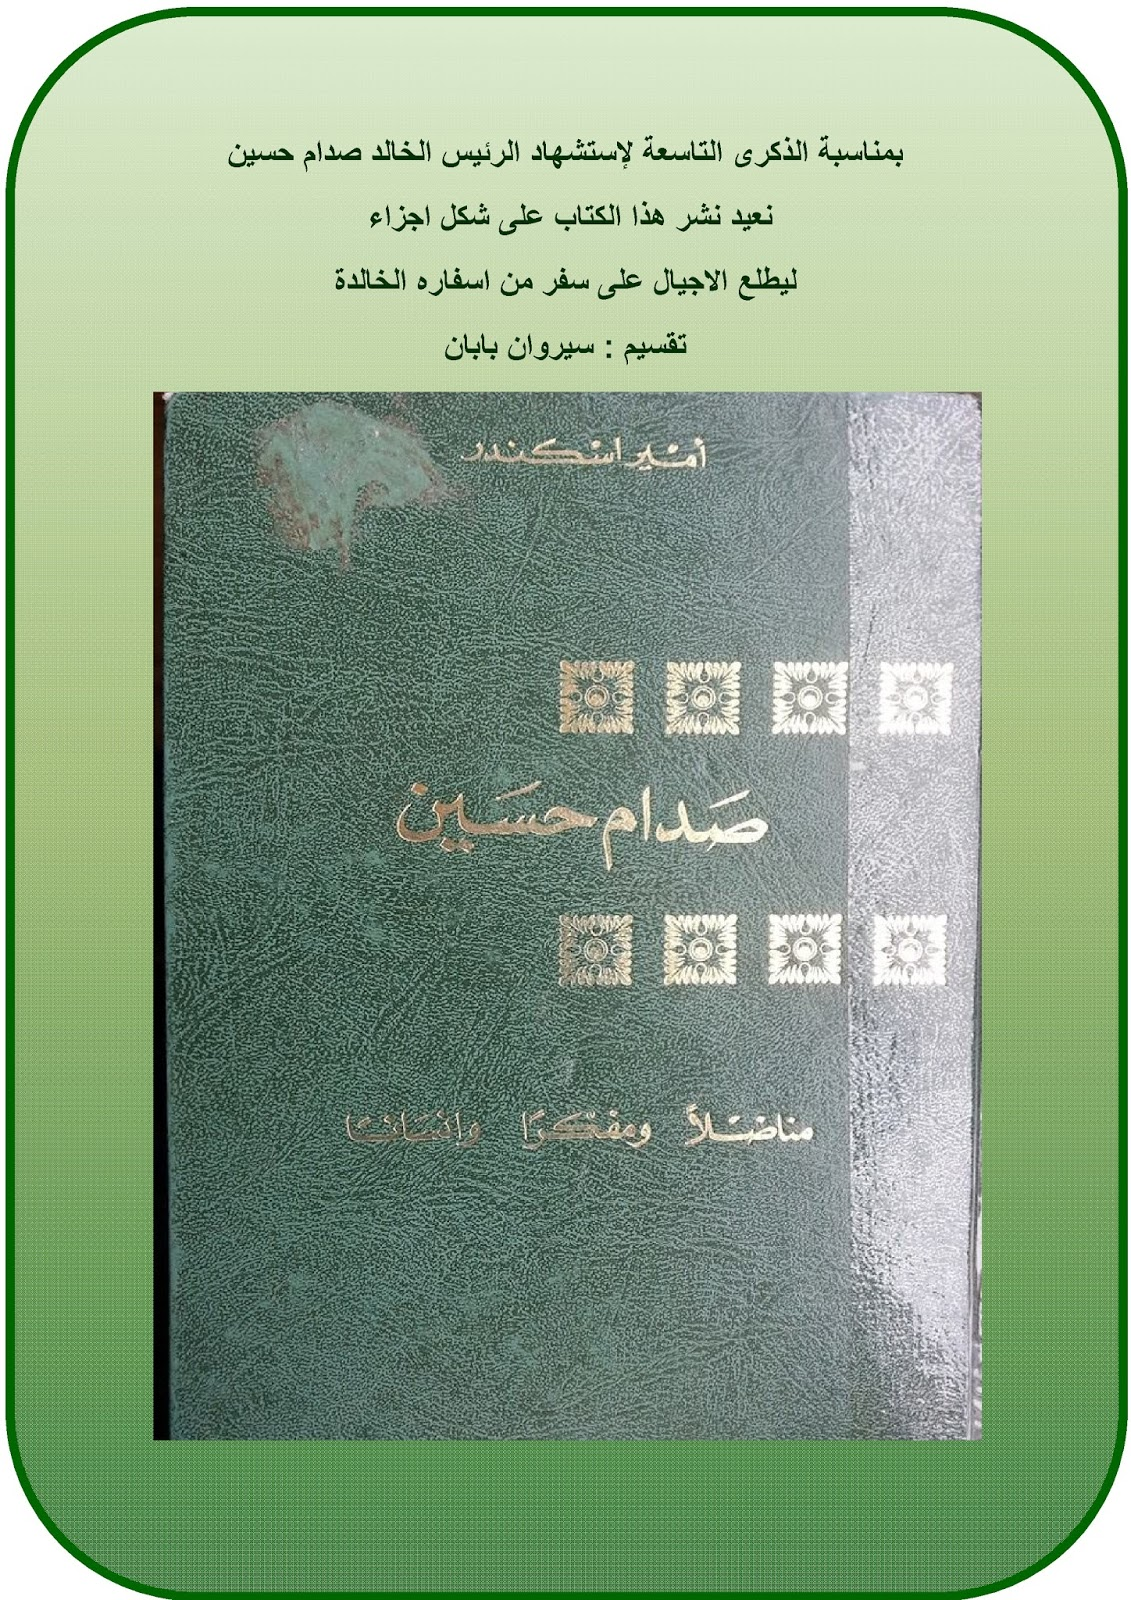 535cb8f96 صوت الثوار والاحرار في الامة العربية : كتاب صدام حسين ..مناضلا مفكرا ...